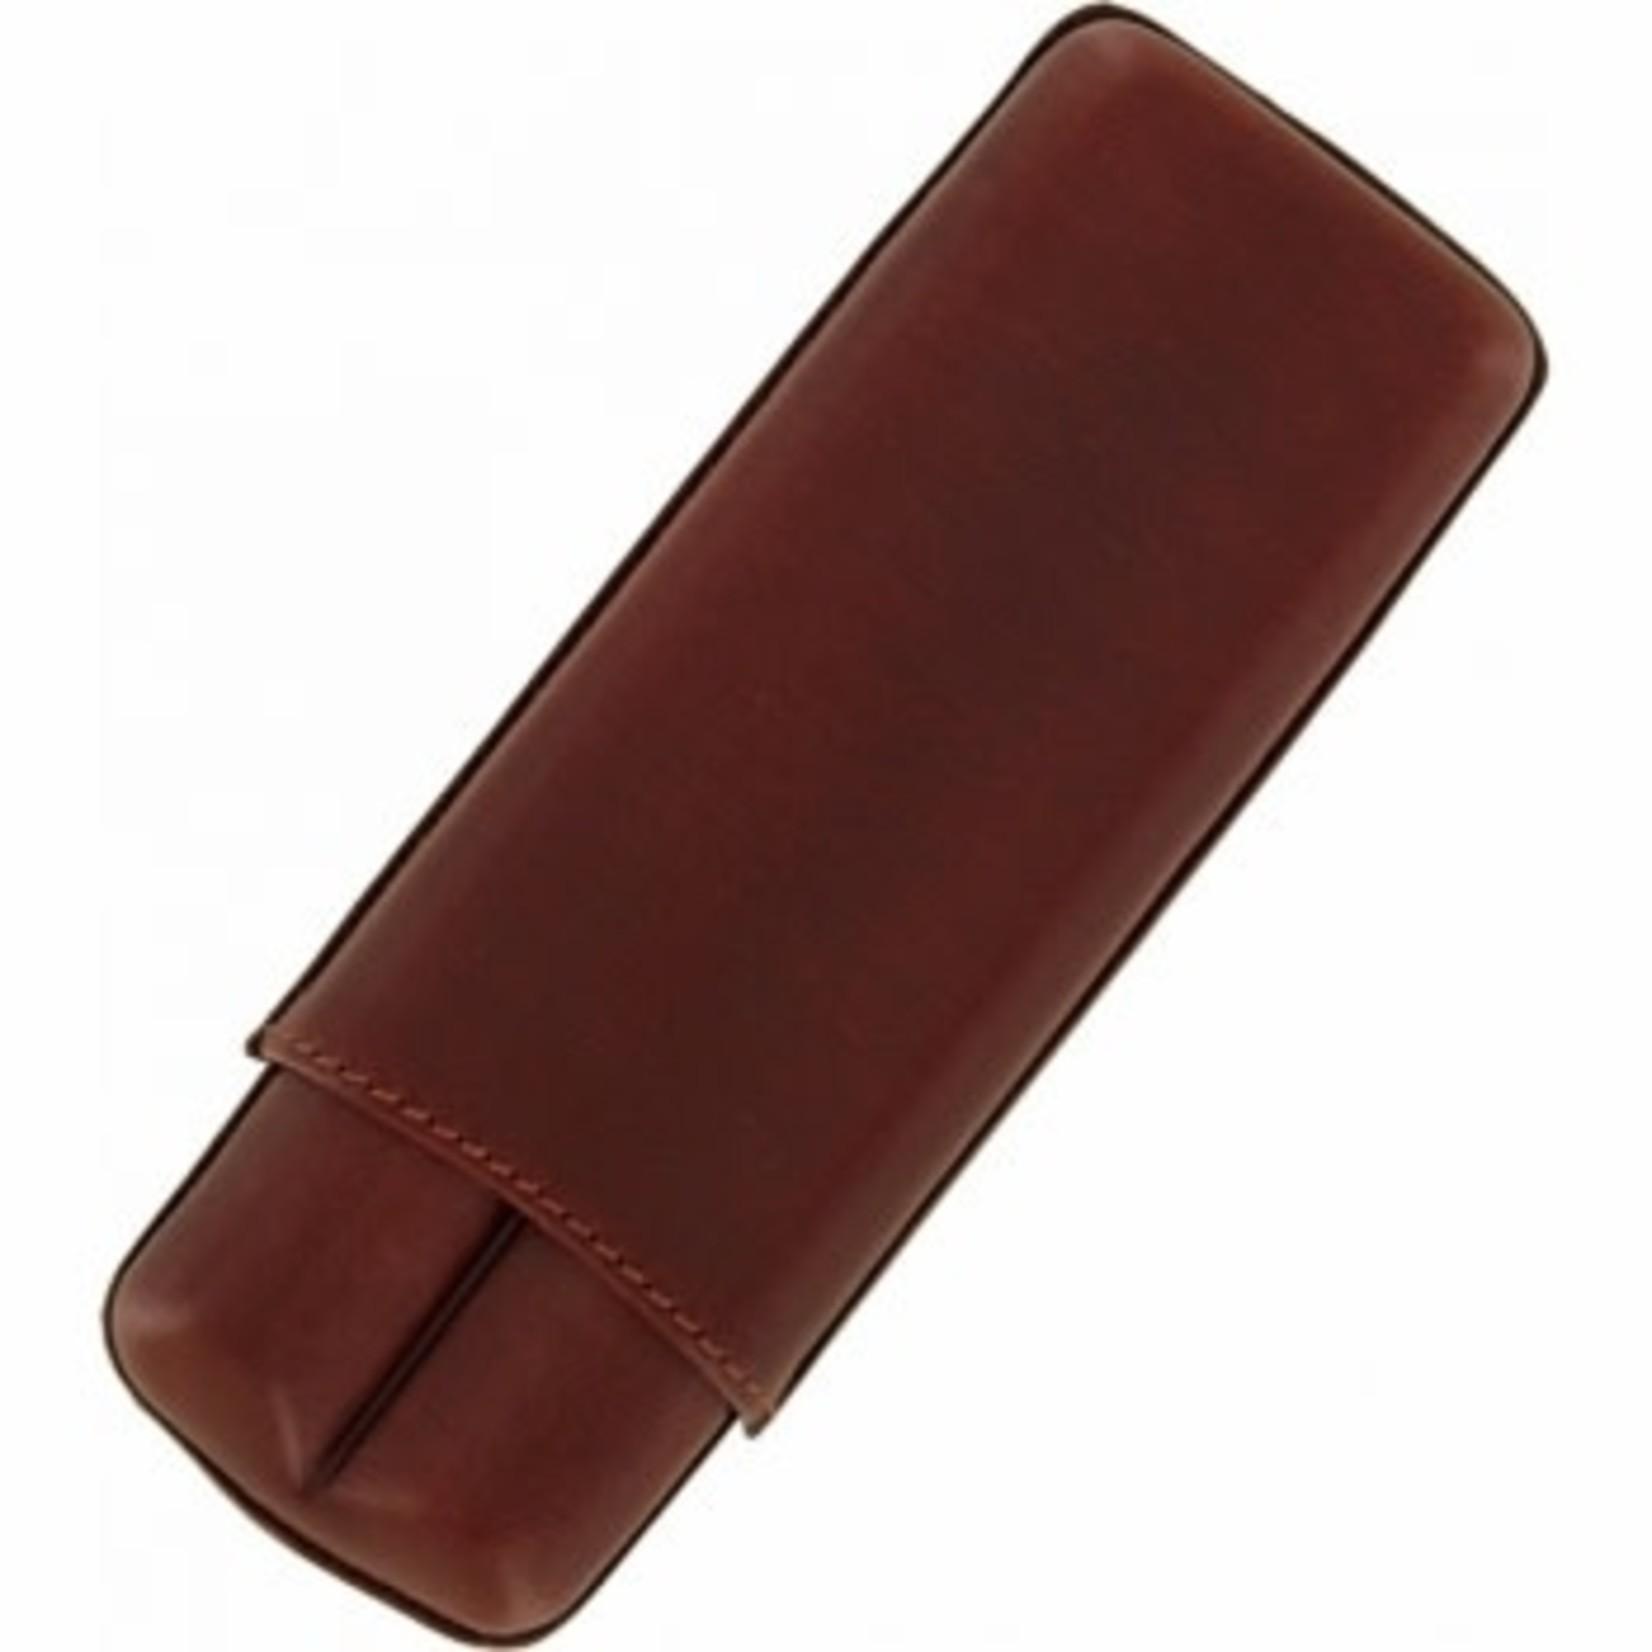 Brighton Cohiba Cigar Case in Brown